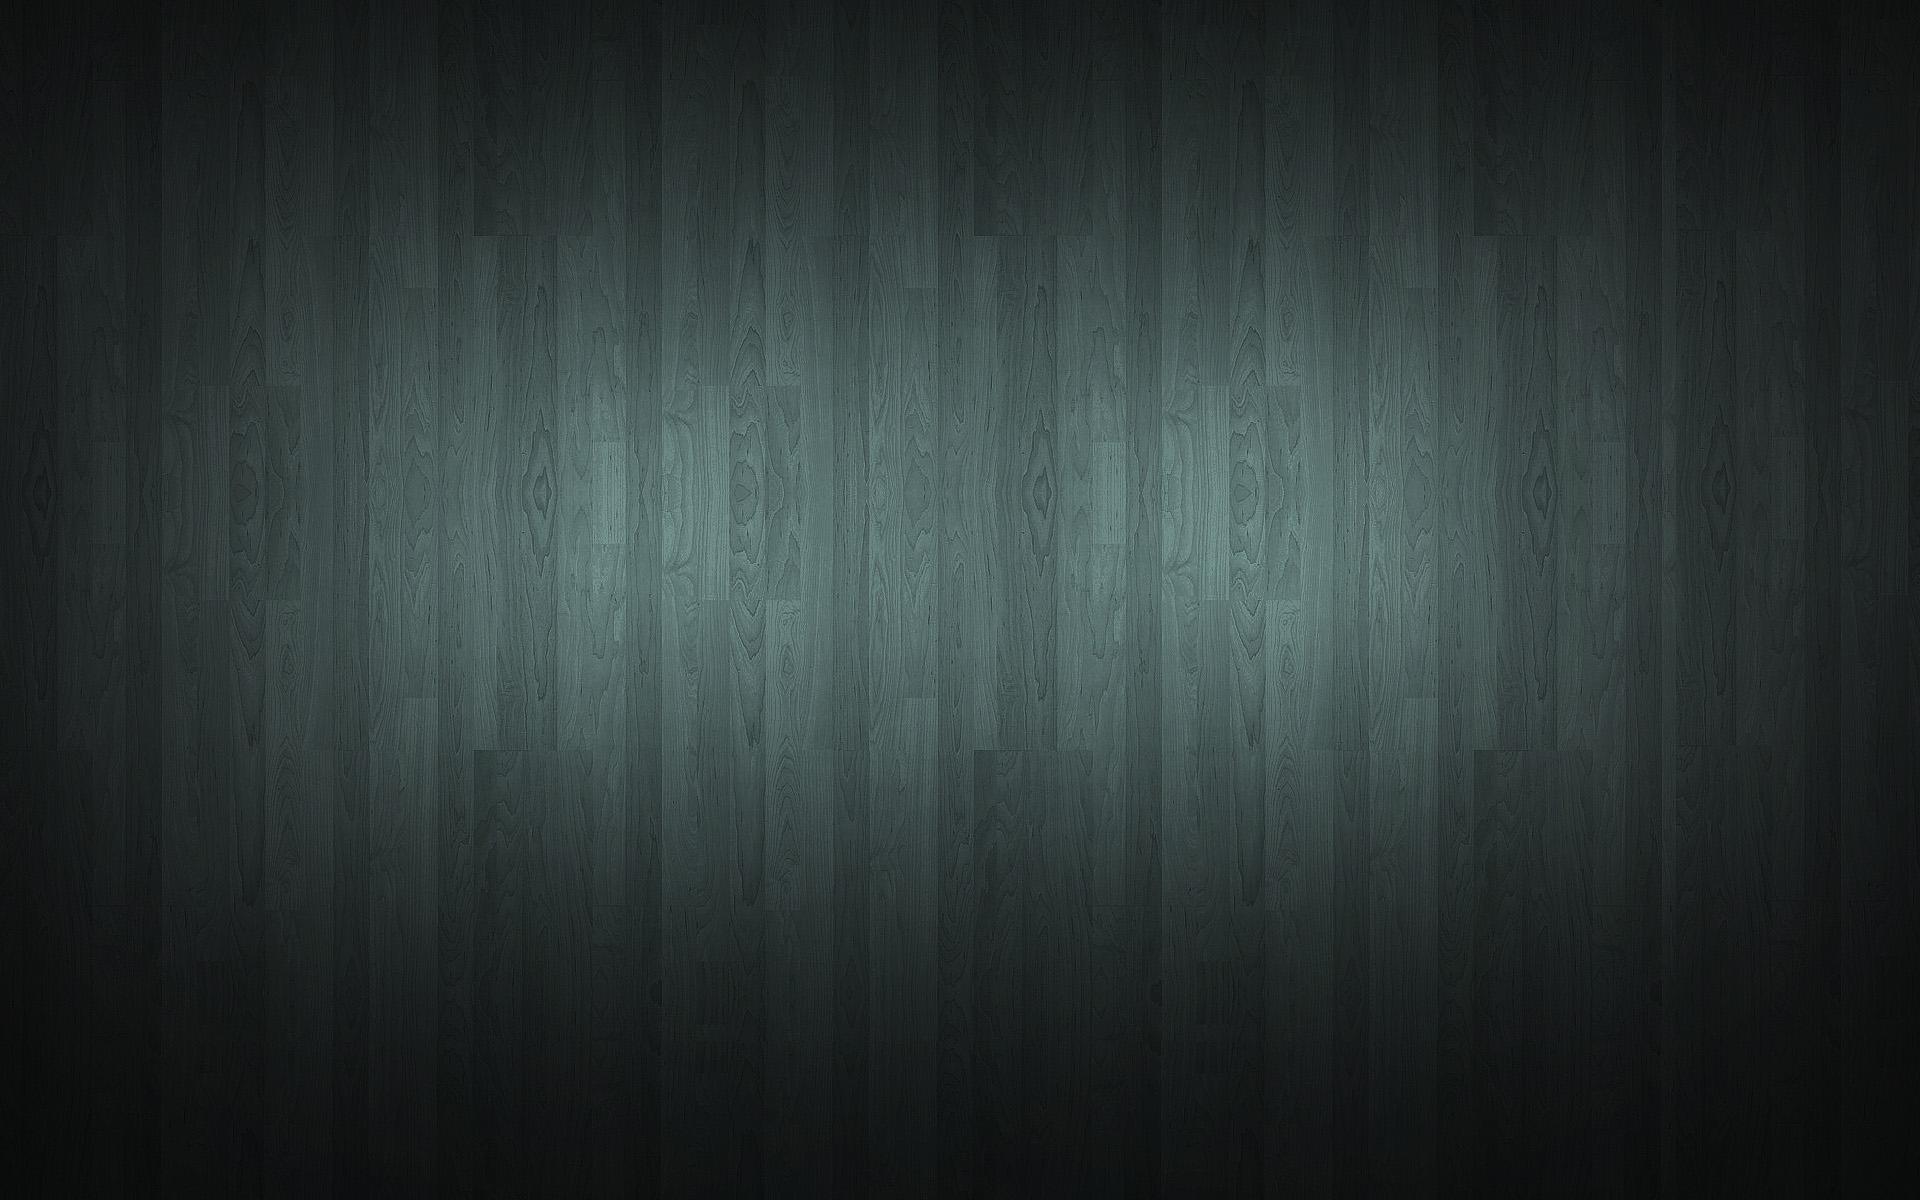 Free Gradient Wallpaper 26032 1920x1080 px